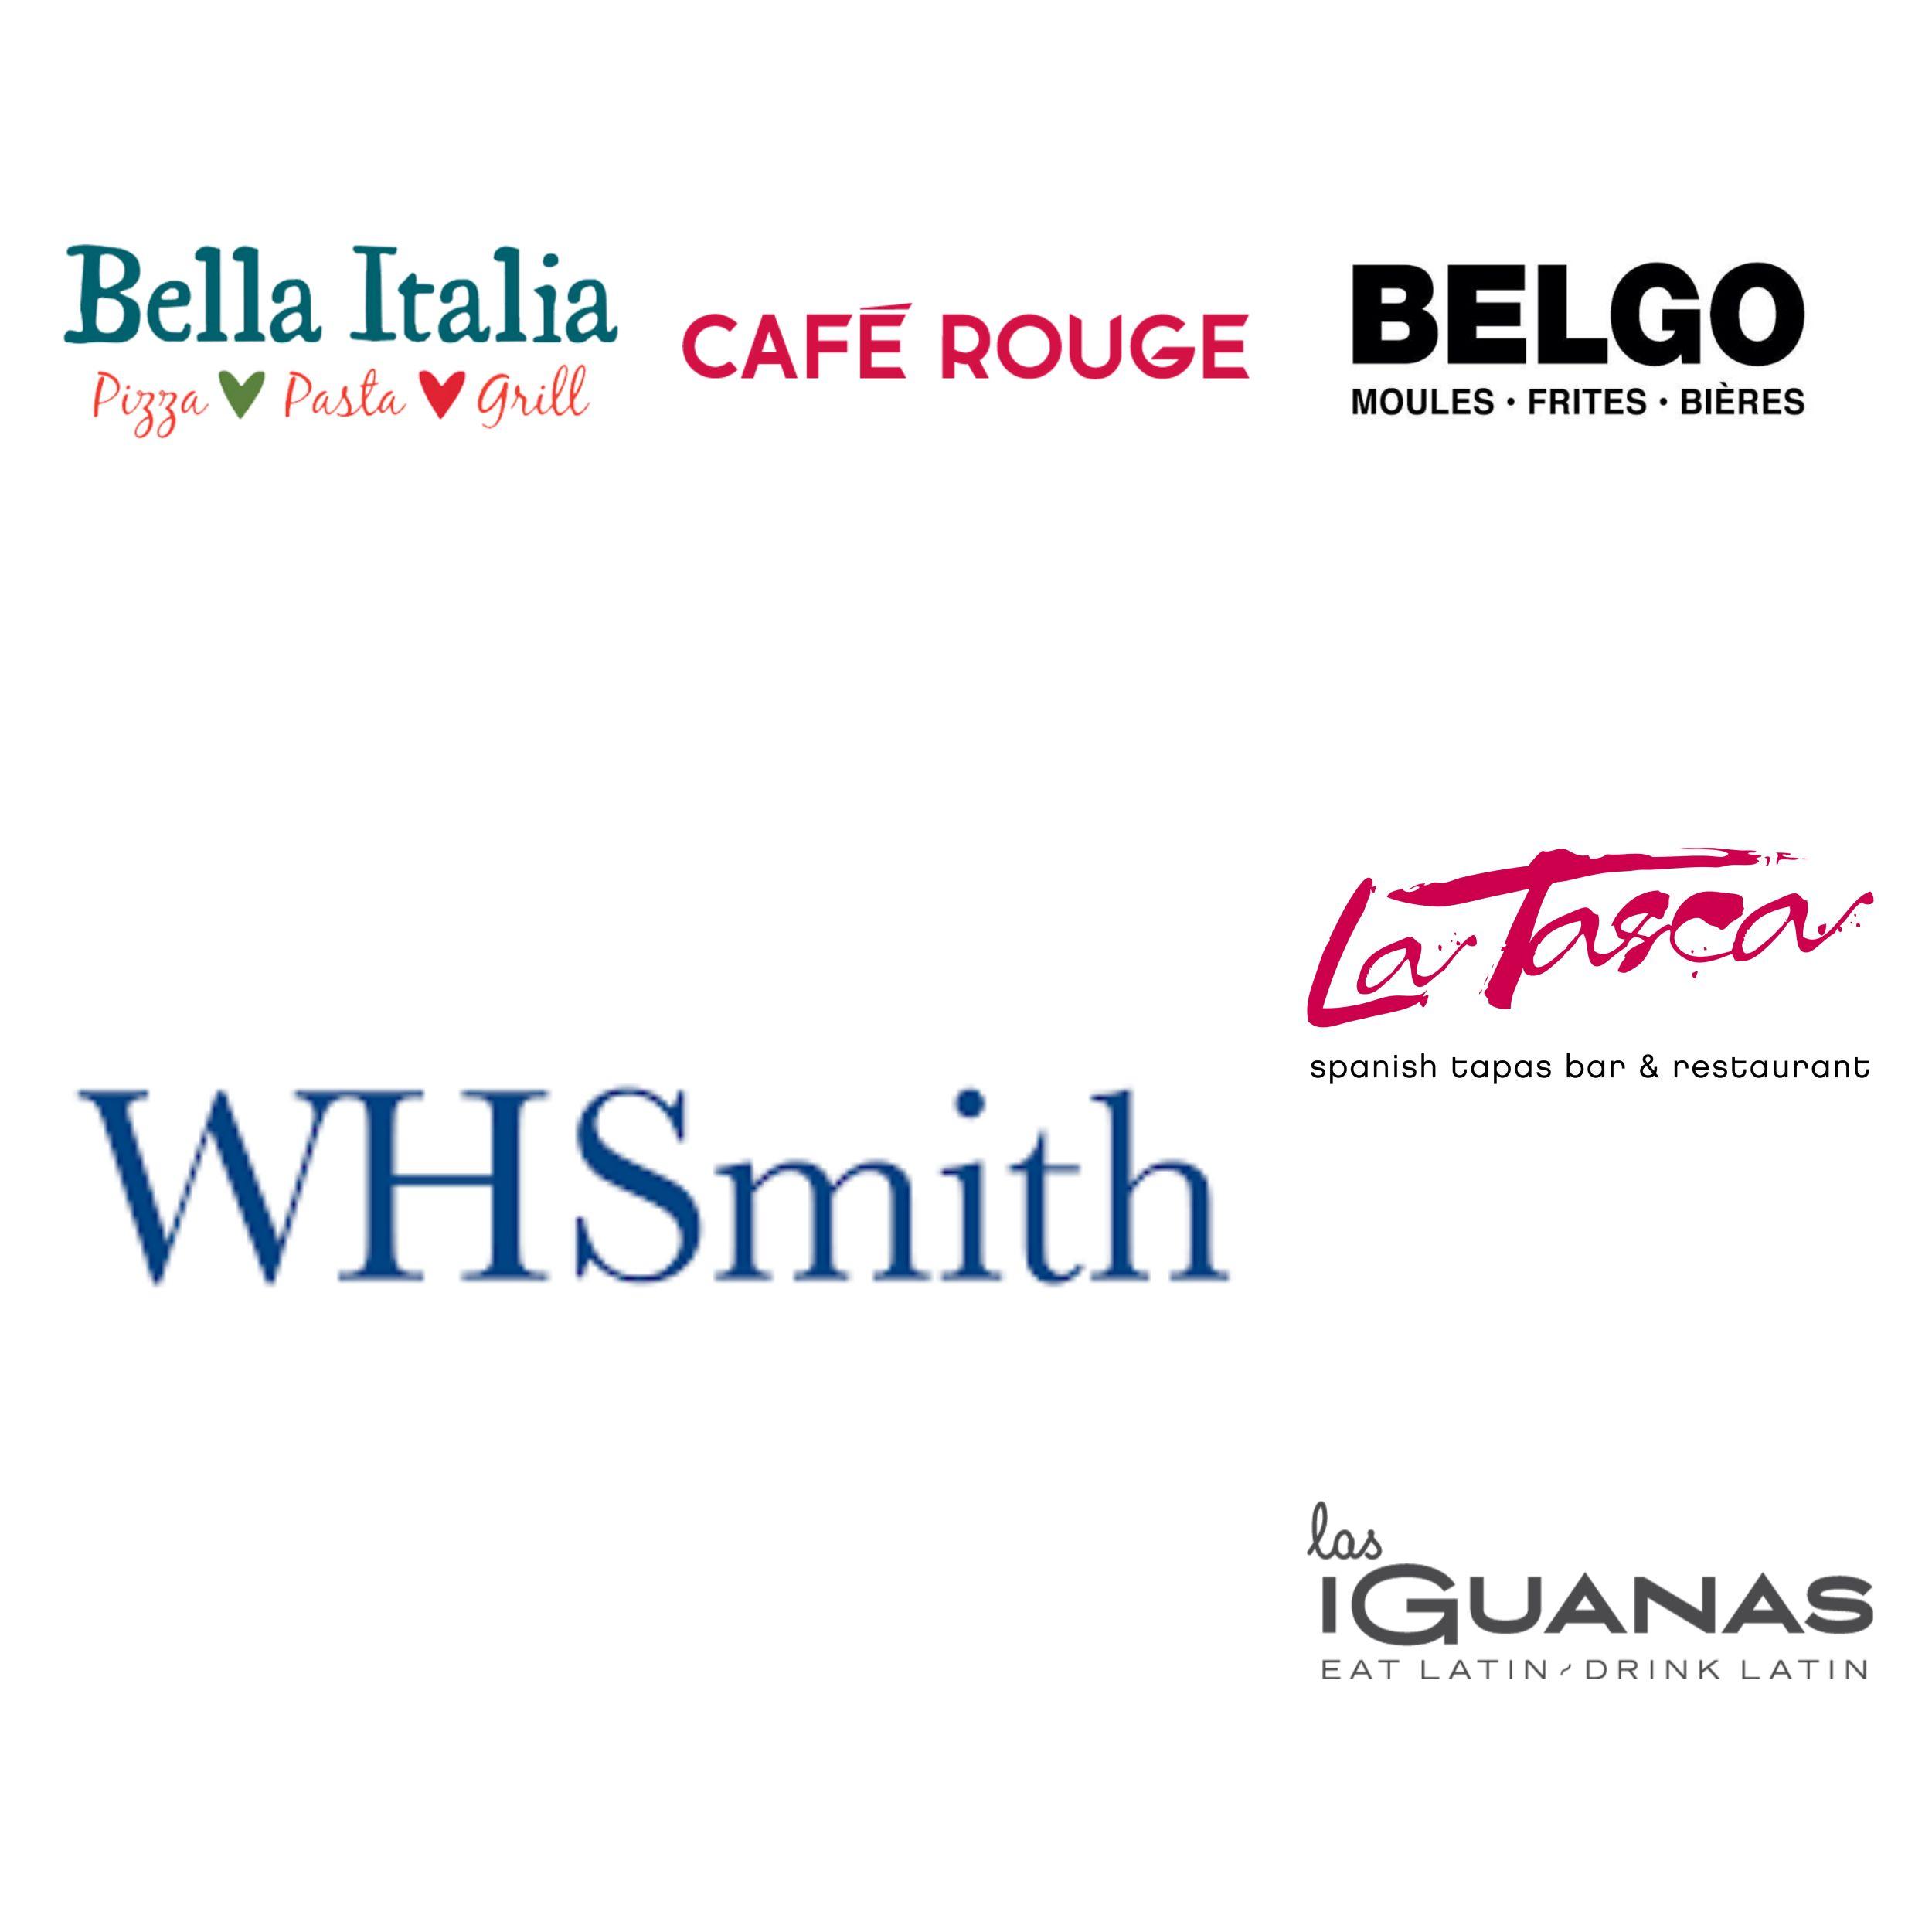 £2 WHSmith Meal Deal OR Free Greggs Hot Drink OR £3 Bella Italia/Café Rouge/La Tasca/Belgo/Las Iguanas + Free Gym + Deliveroo £4 off @ Wuntu